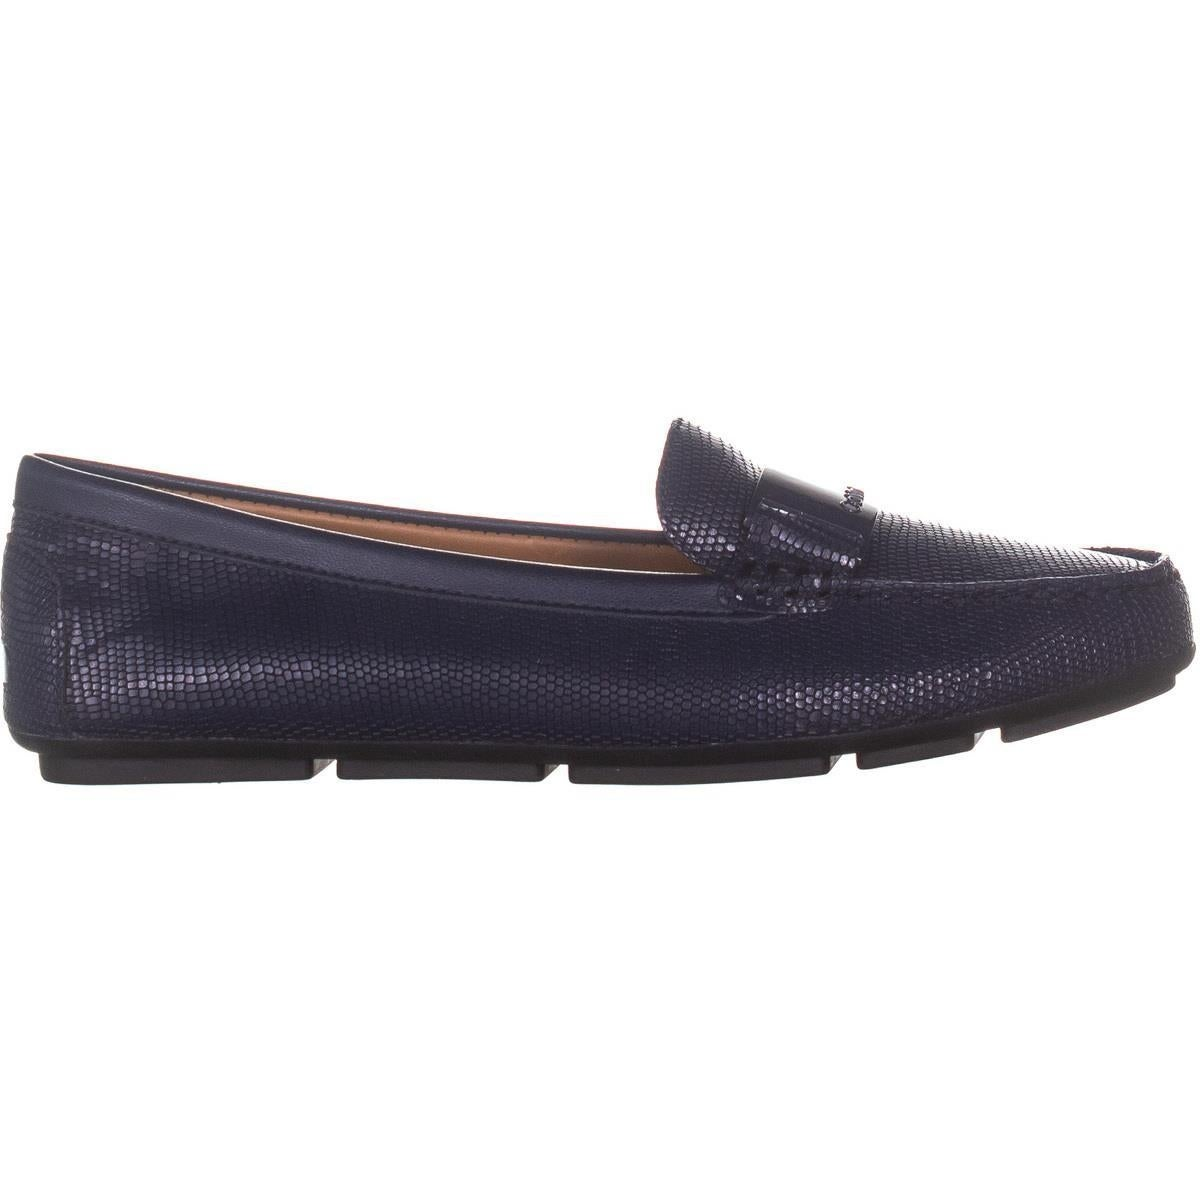 b5a6a4e150d Shop Calvin Klein Lisette Slip-On Dress Loafers